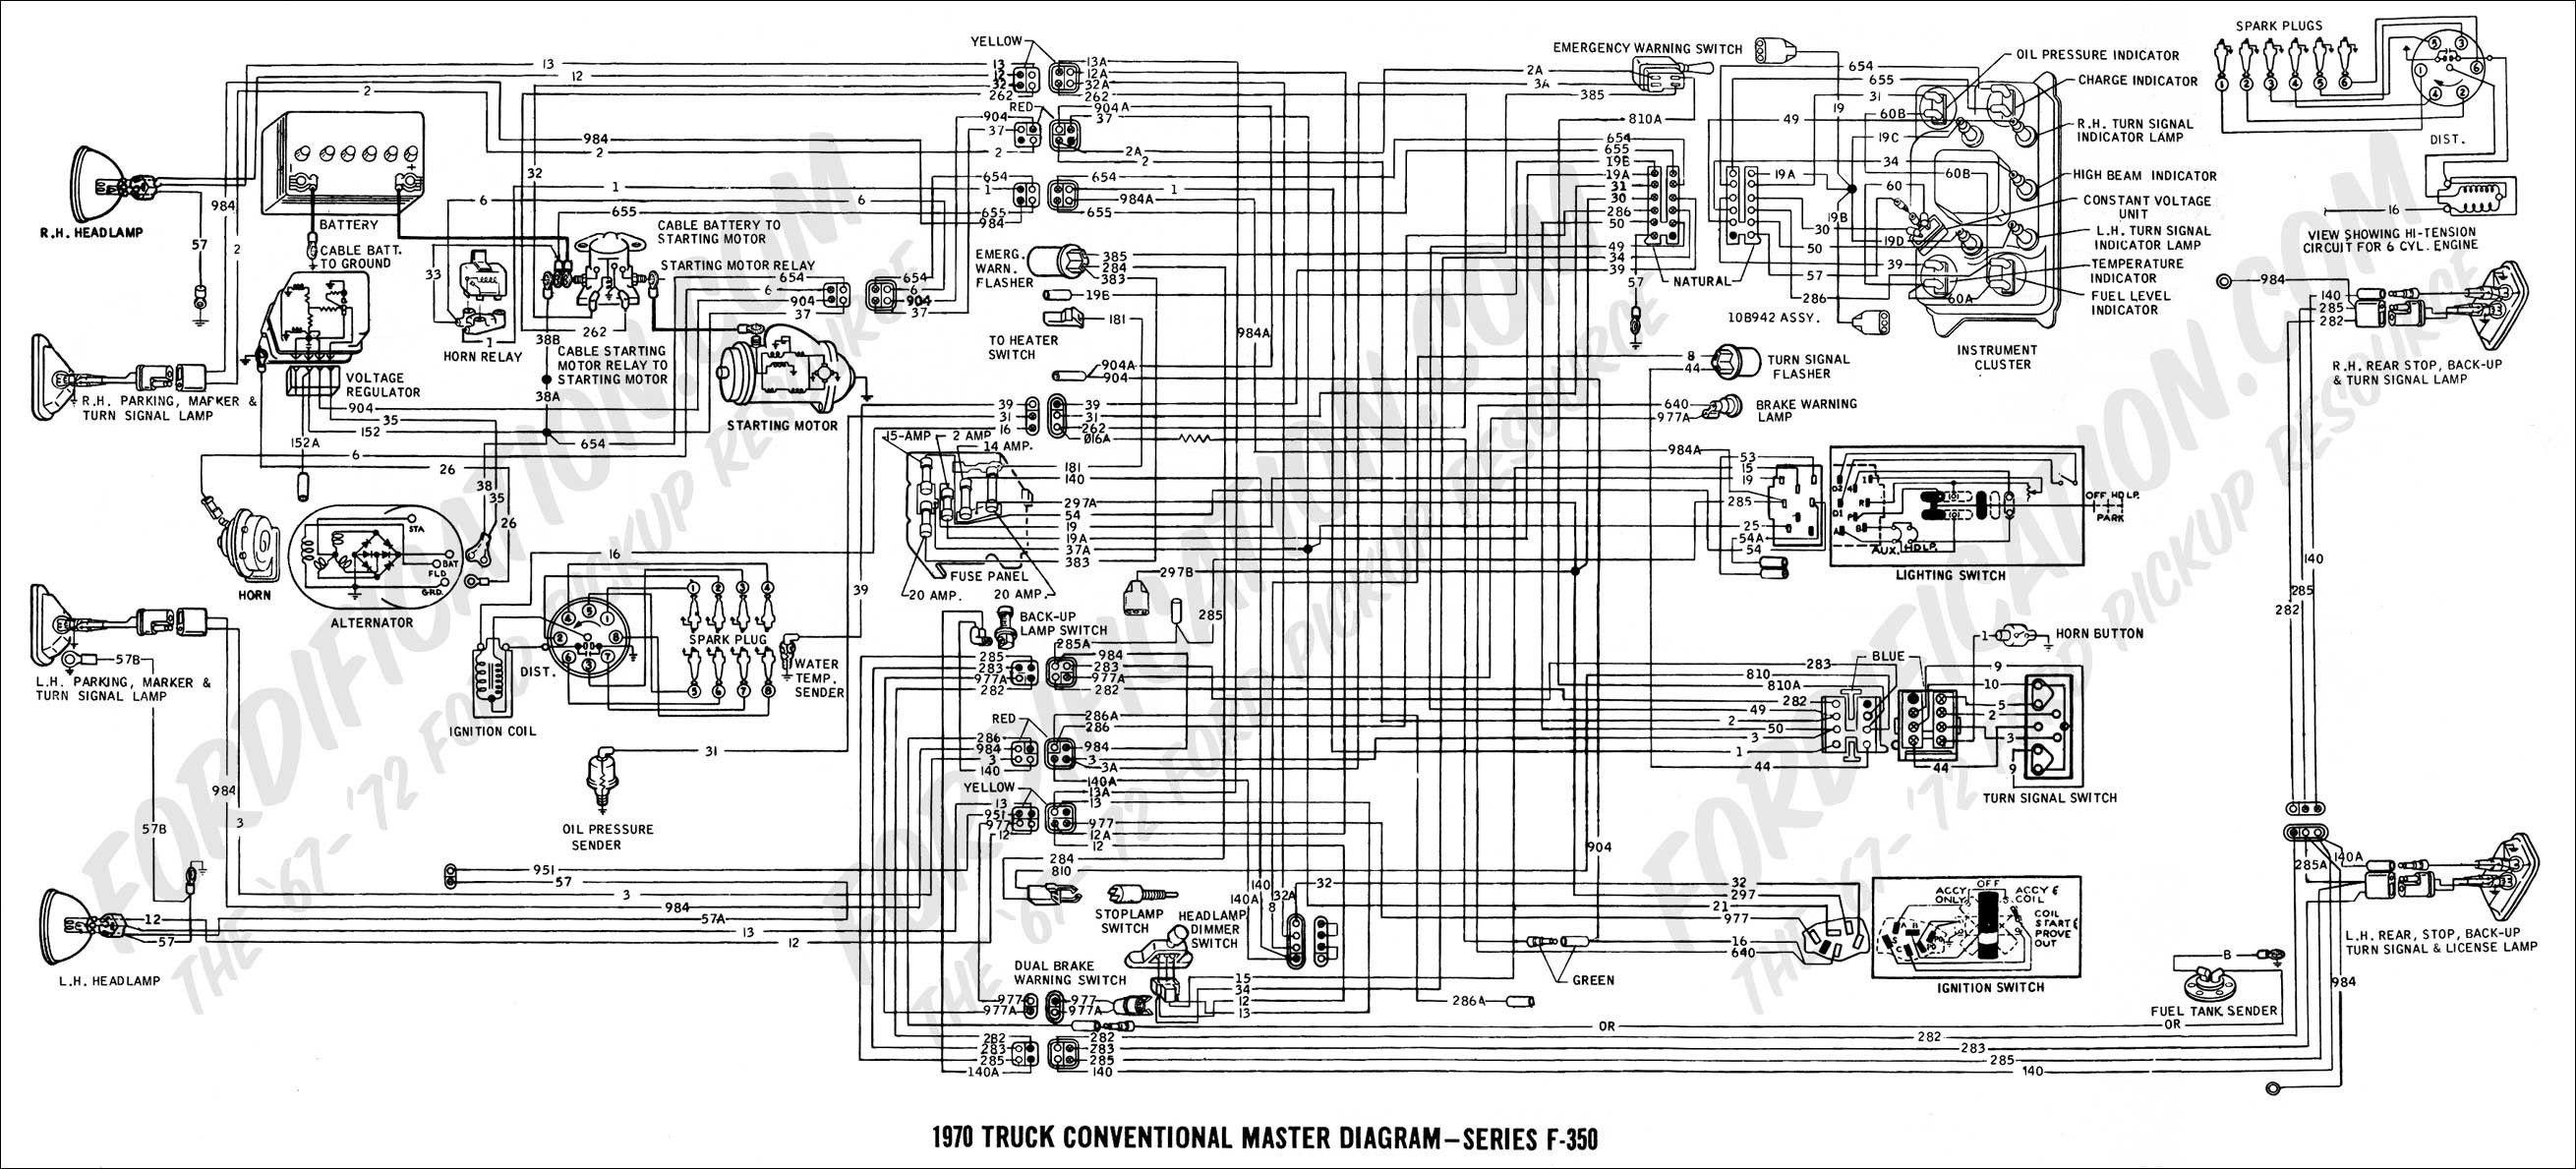 2006 ford f550 wiring schematic - wiring ddiagrams home pen-copy -  pen-copy.brixiaproart.it  brixia pro art